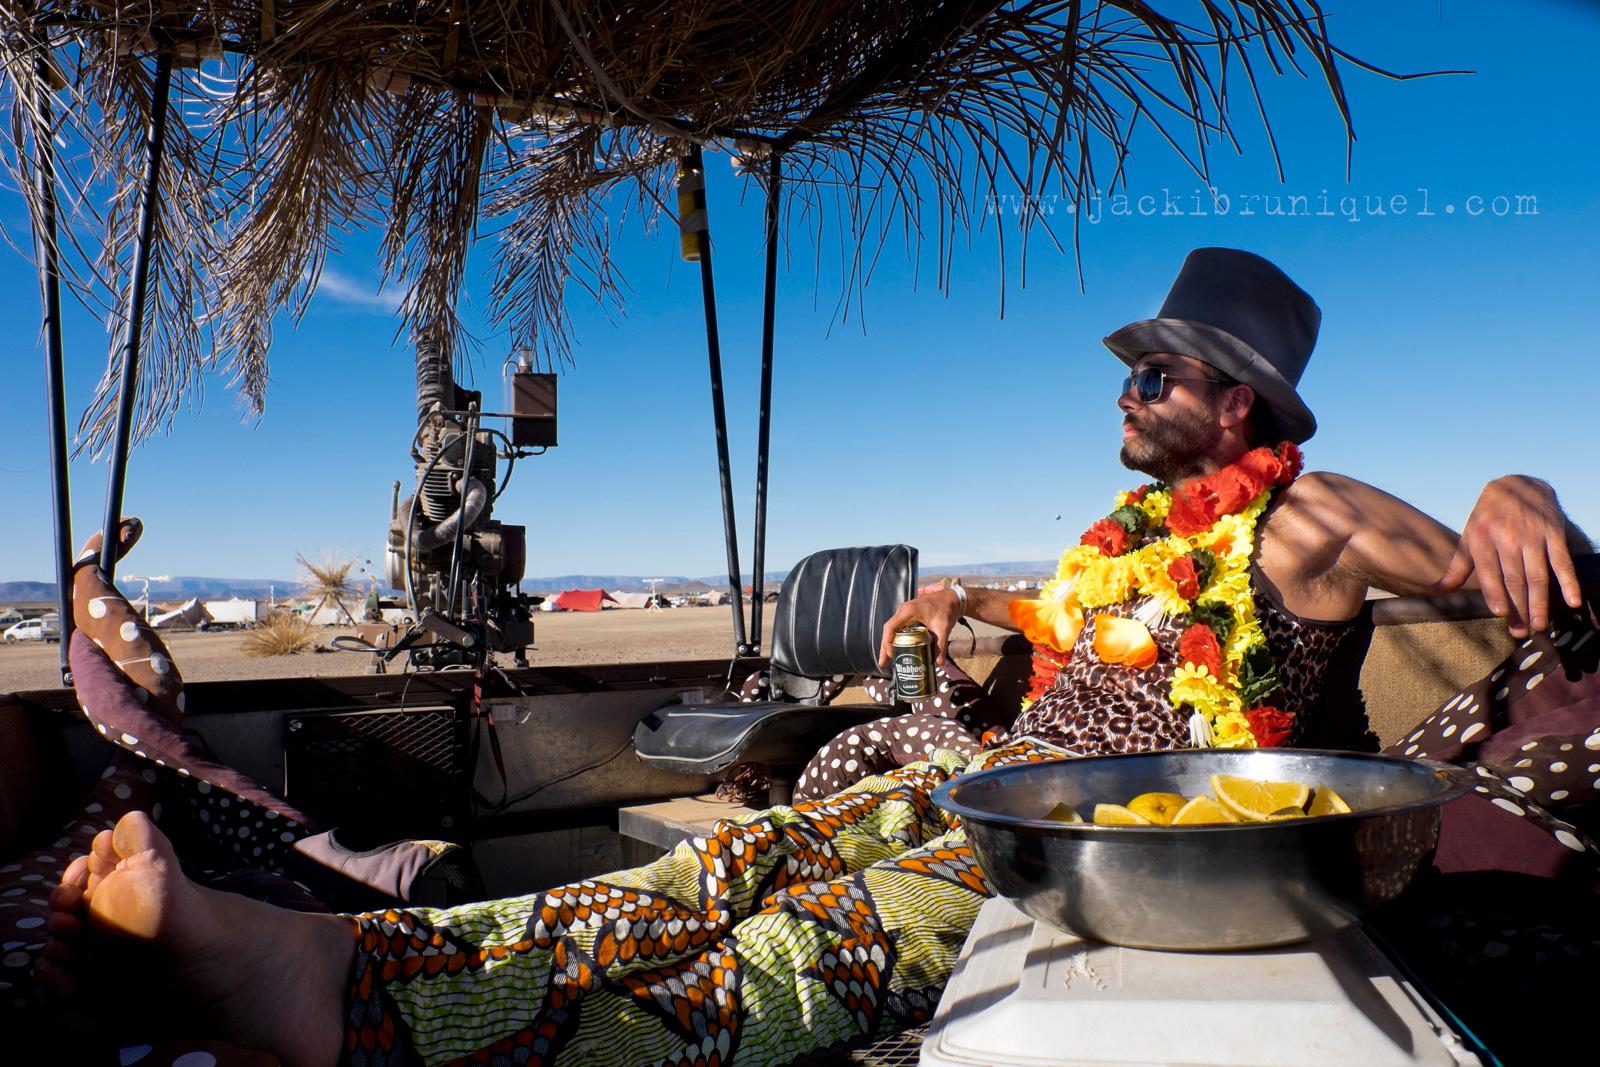 Afrika-Burn-2016-Creative-South-African-Photographer-Jacki-Bruniquel-026.jpg